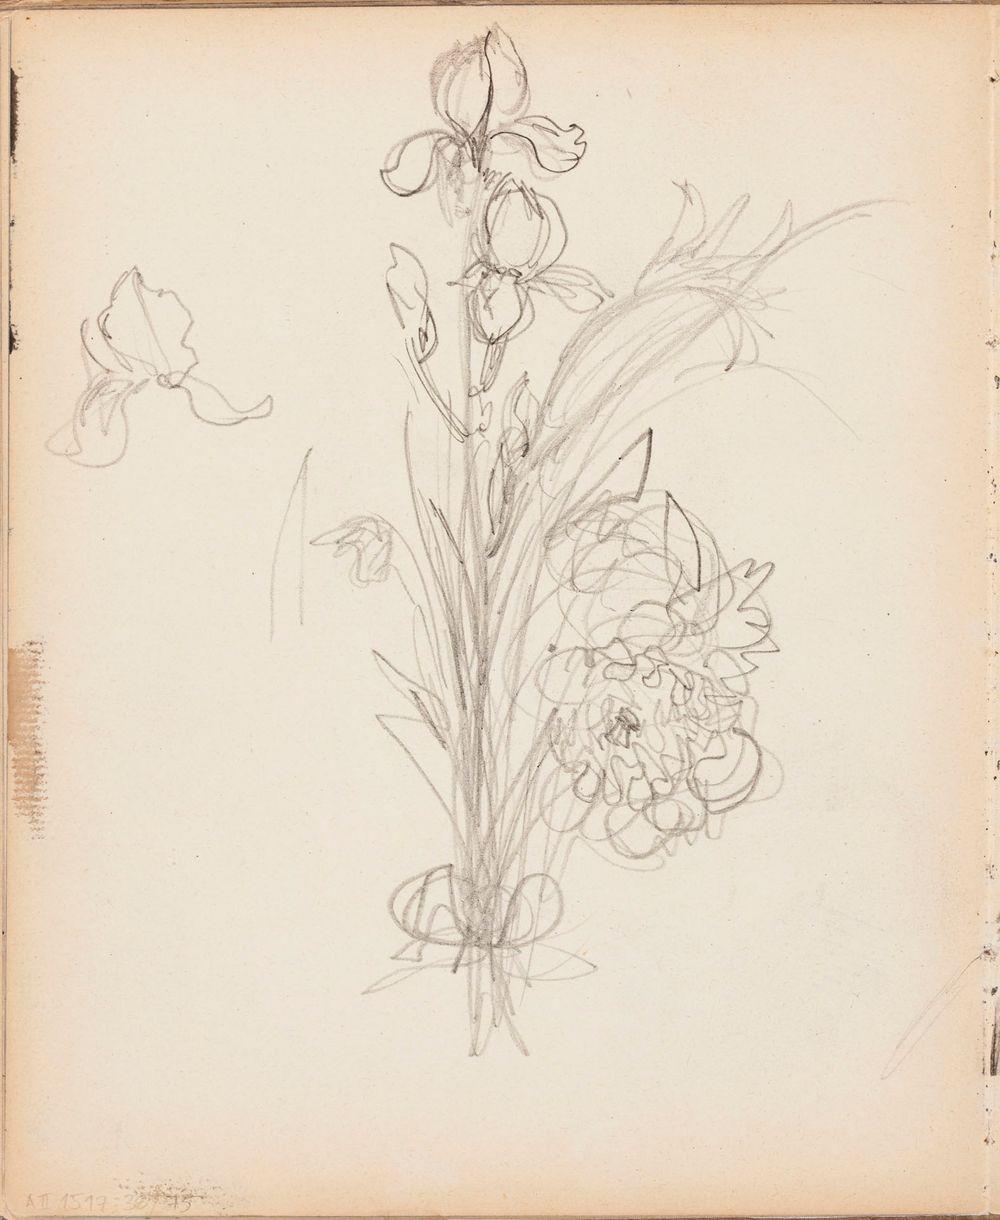 Kukkakimppu